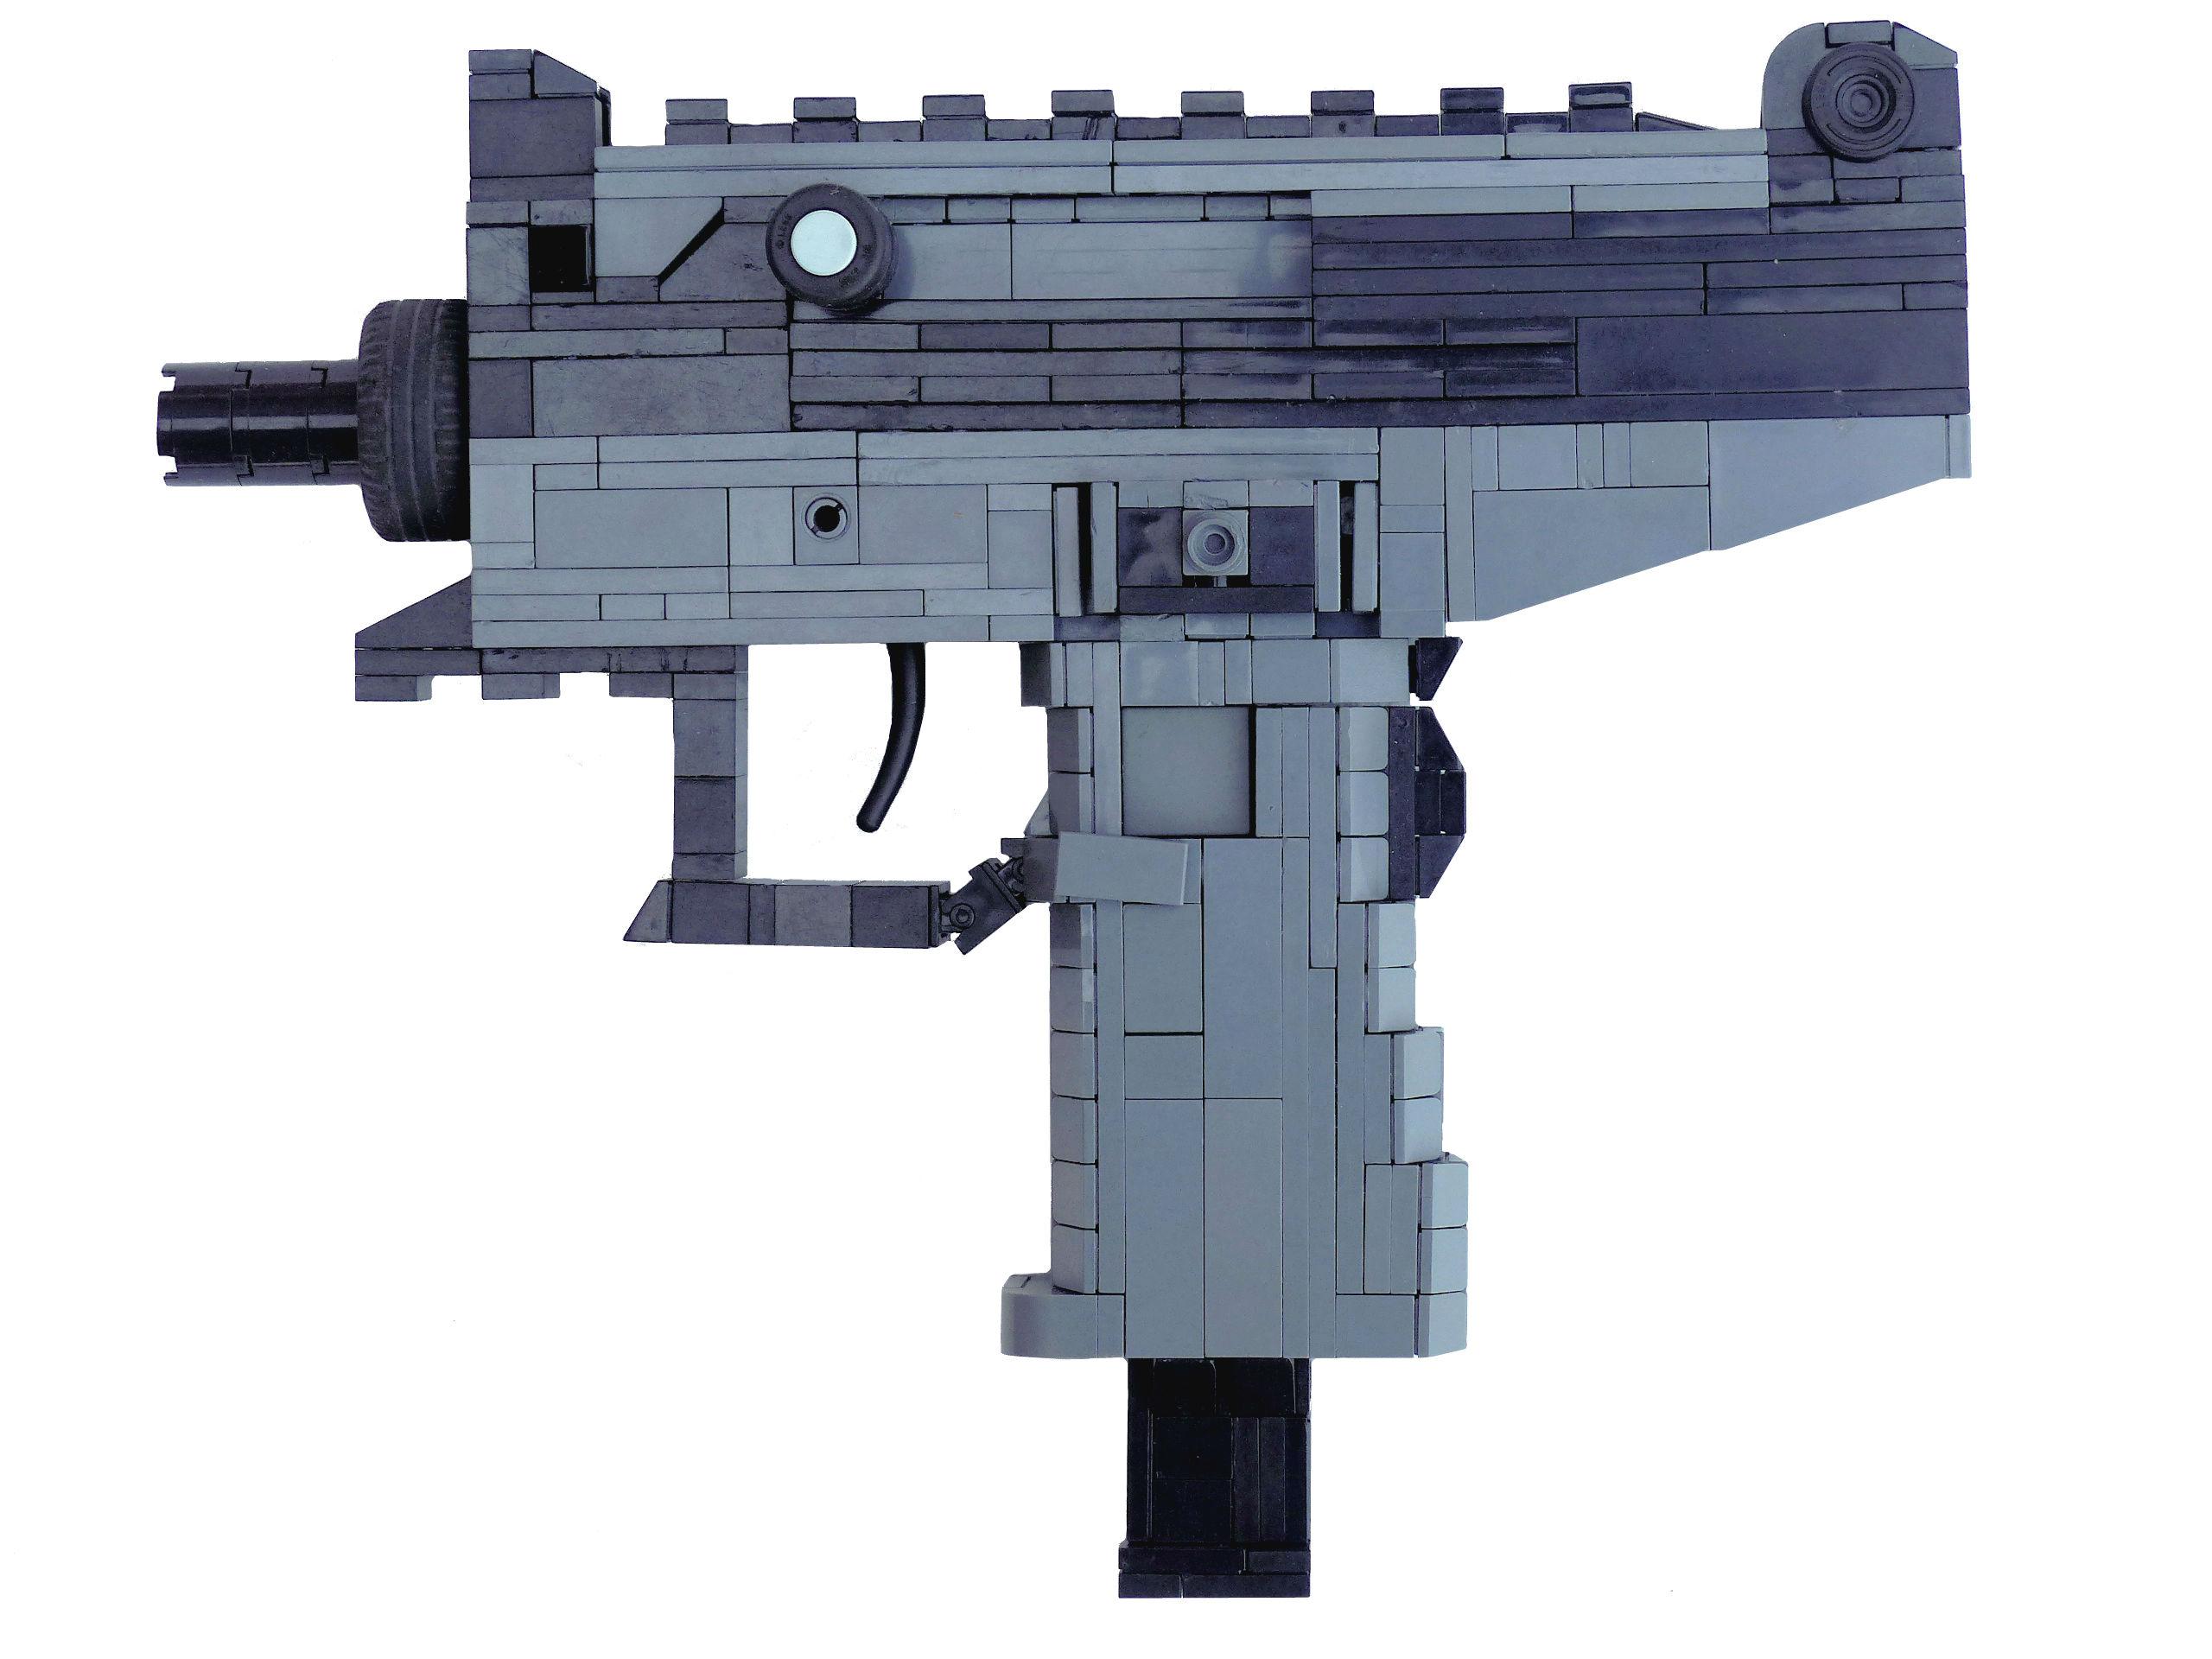 Hintergrundbilder Gewehr Lego Maschine Pistole Profi Uzi